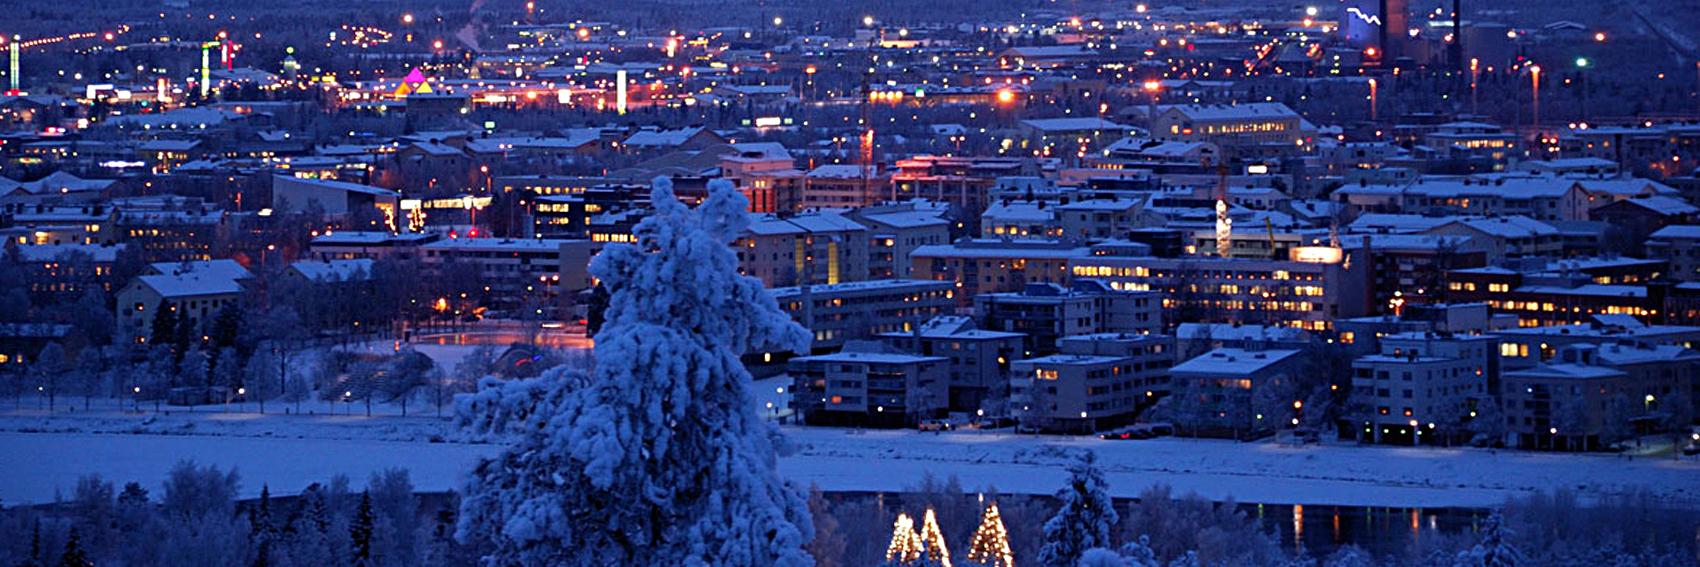 File:Rovaniemi banner.jpg - Wikimedia Commons